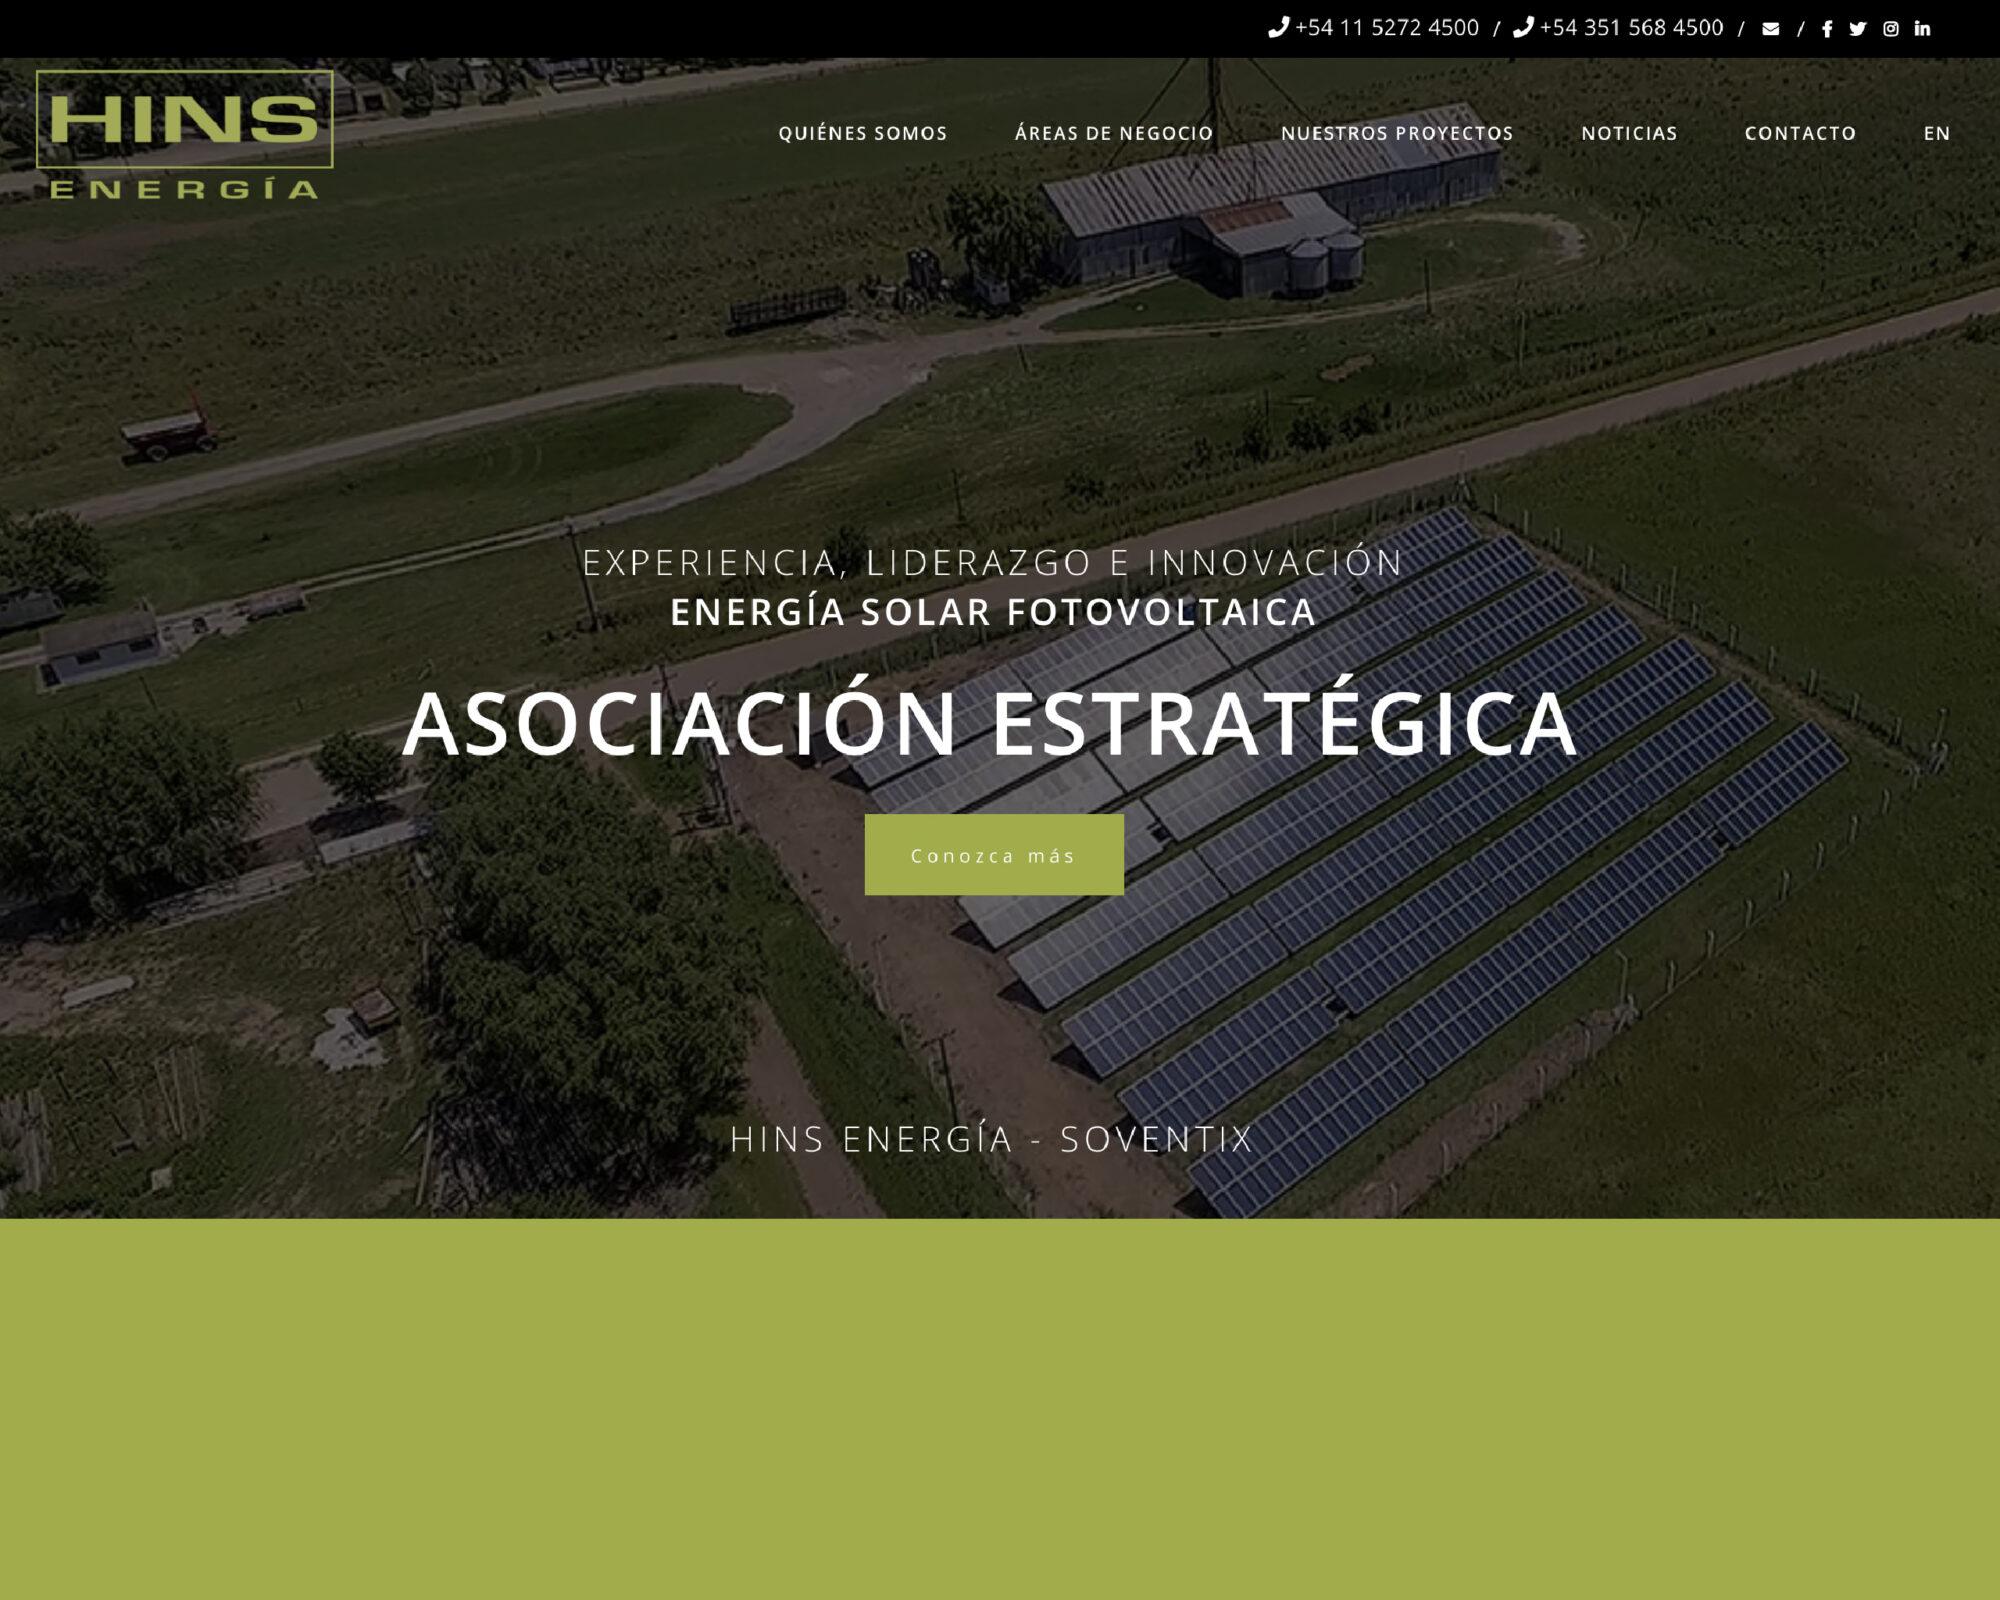 website-HINS@2x-100